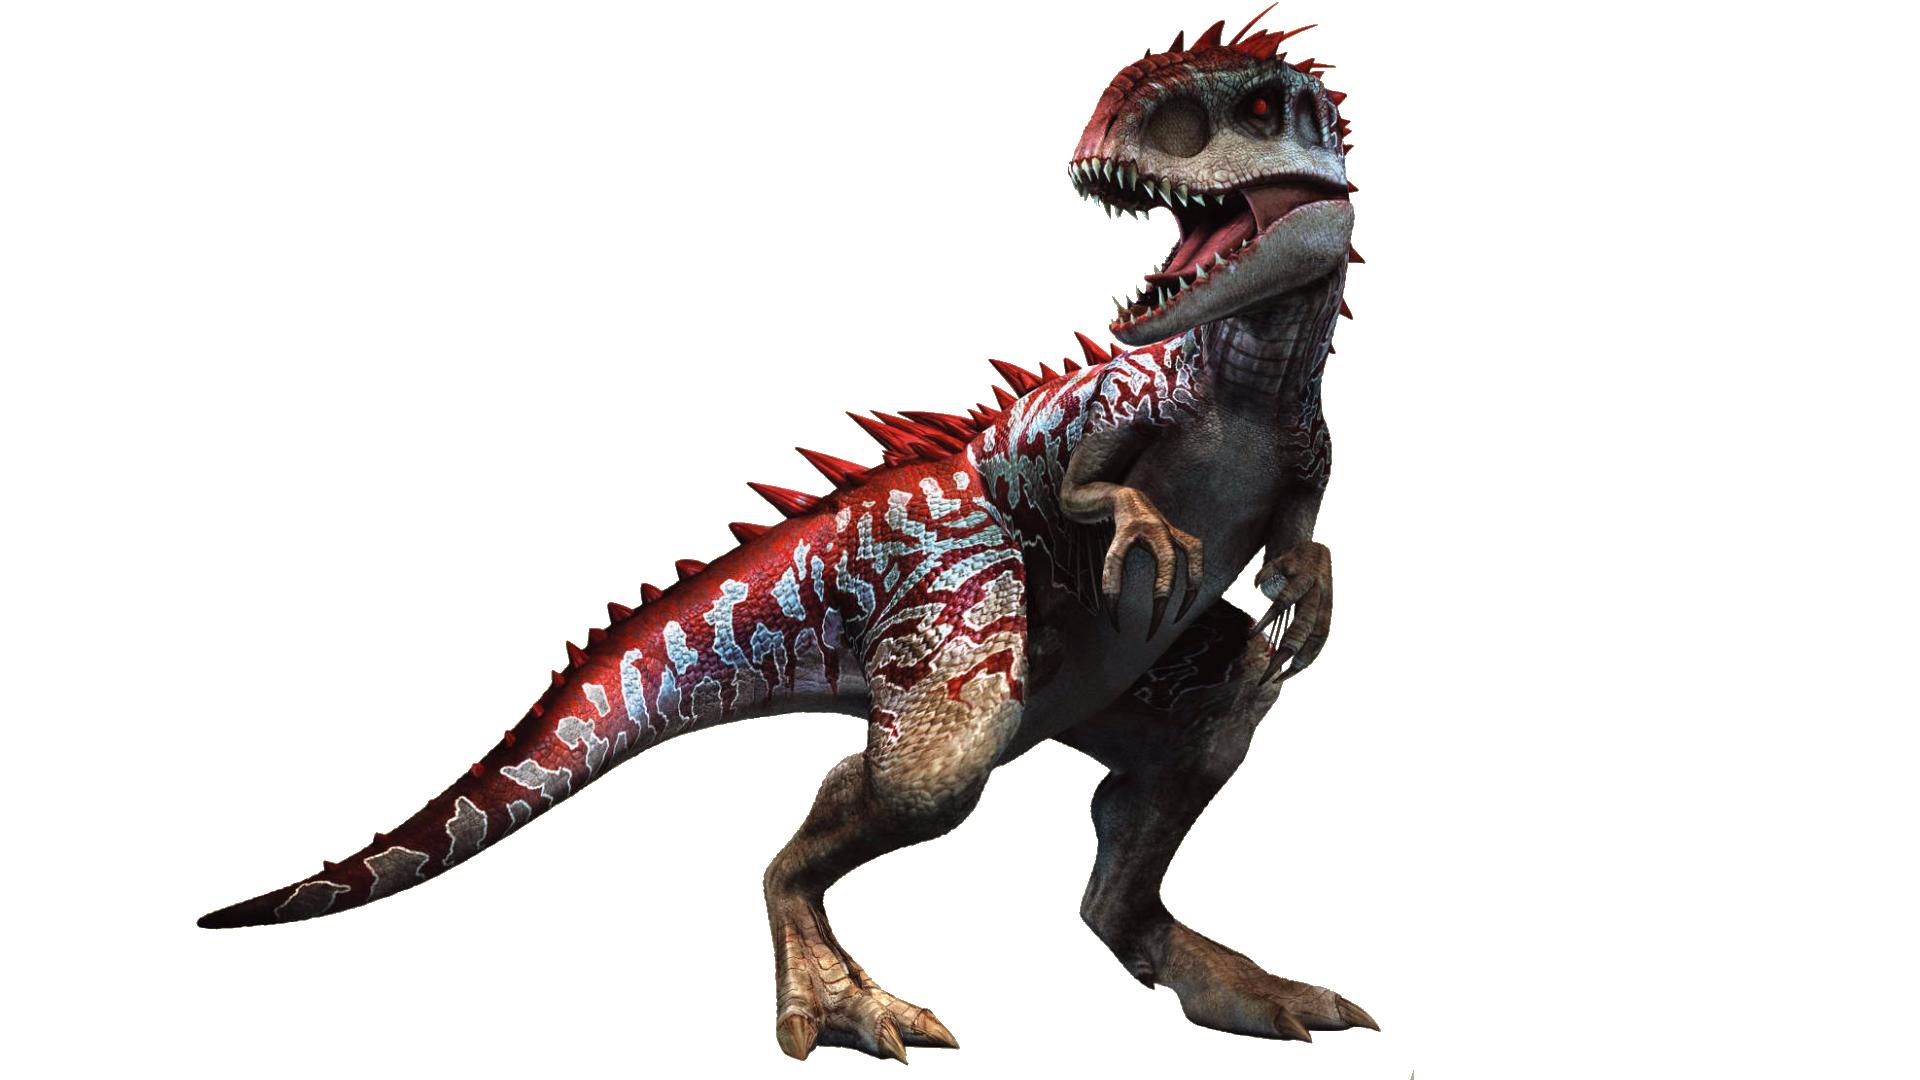 Jurassic World The Game Hybrid Indominus Rex by